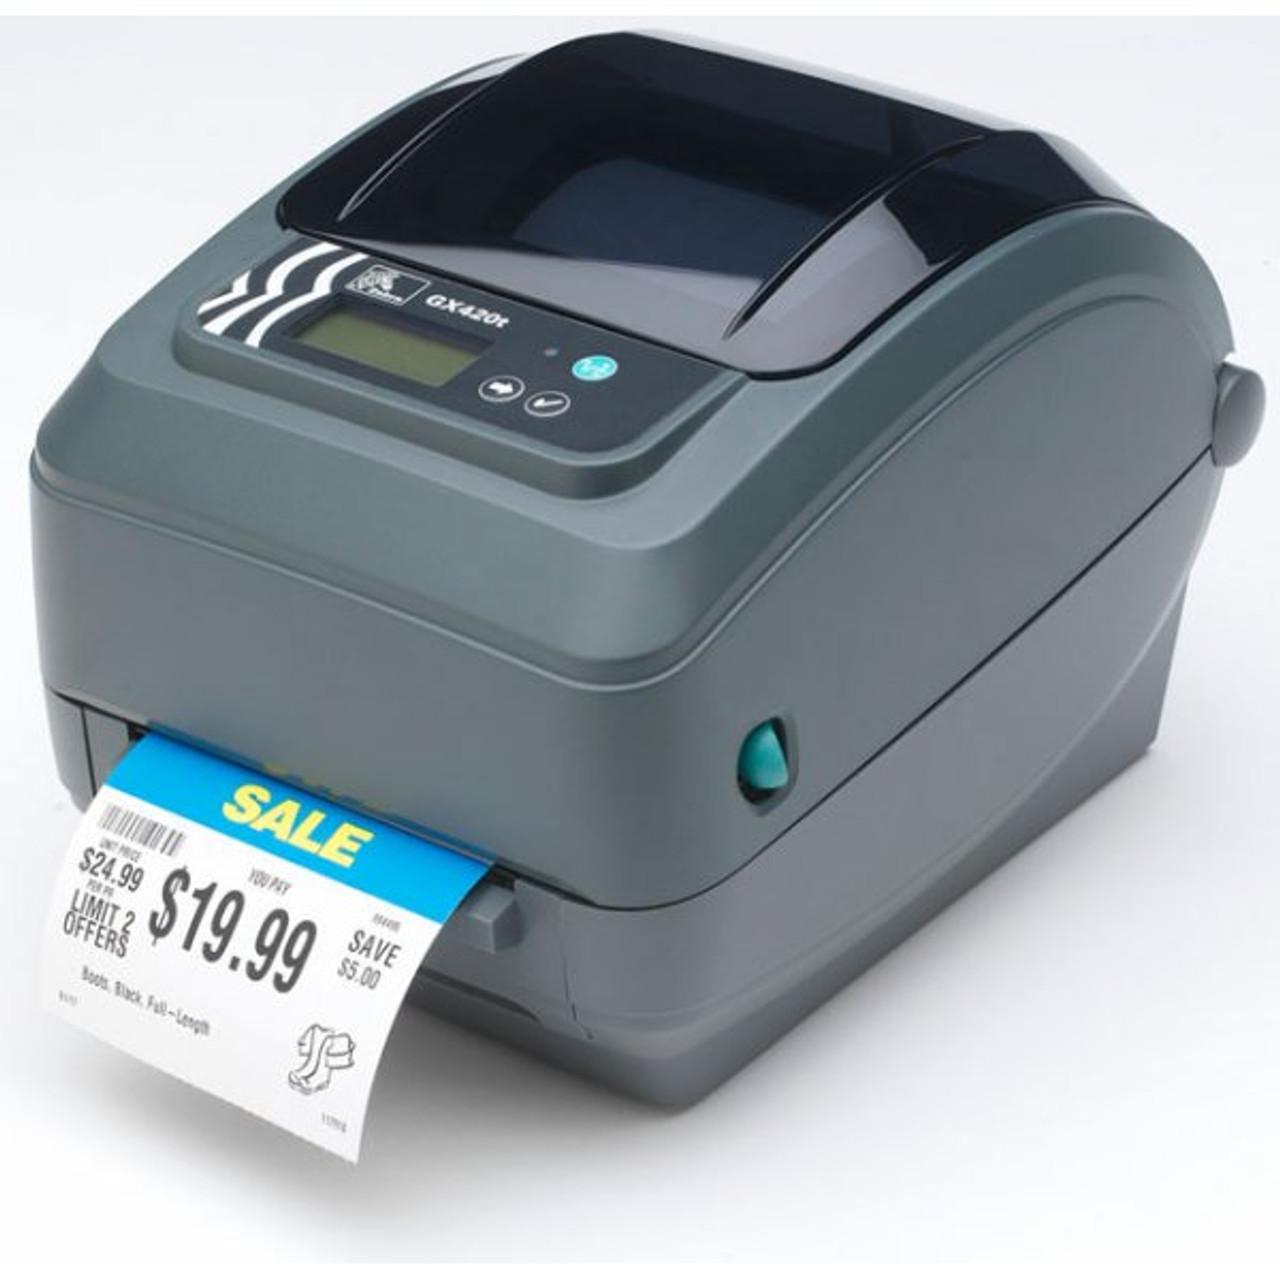 Zebra GX420d 4 Inch Direct Thermal, POS Barcode Label Printer